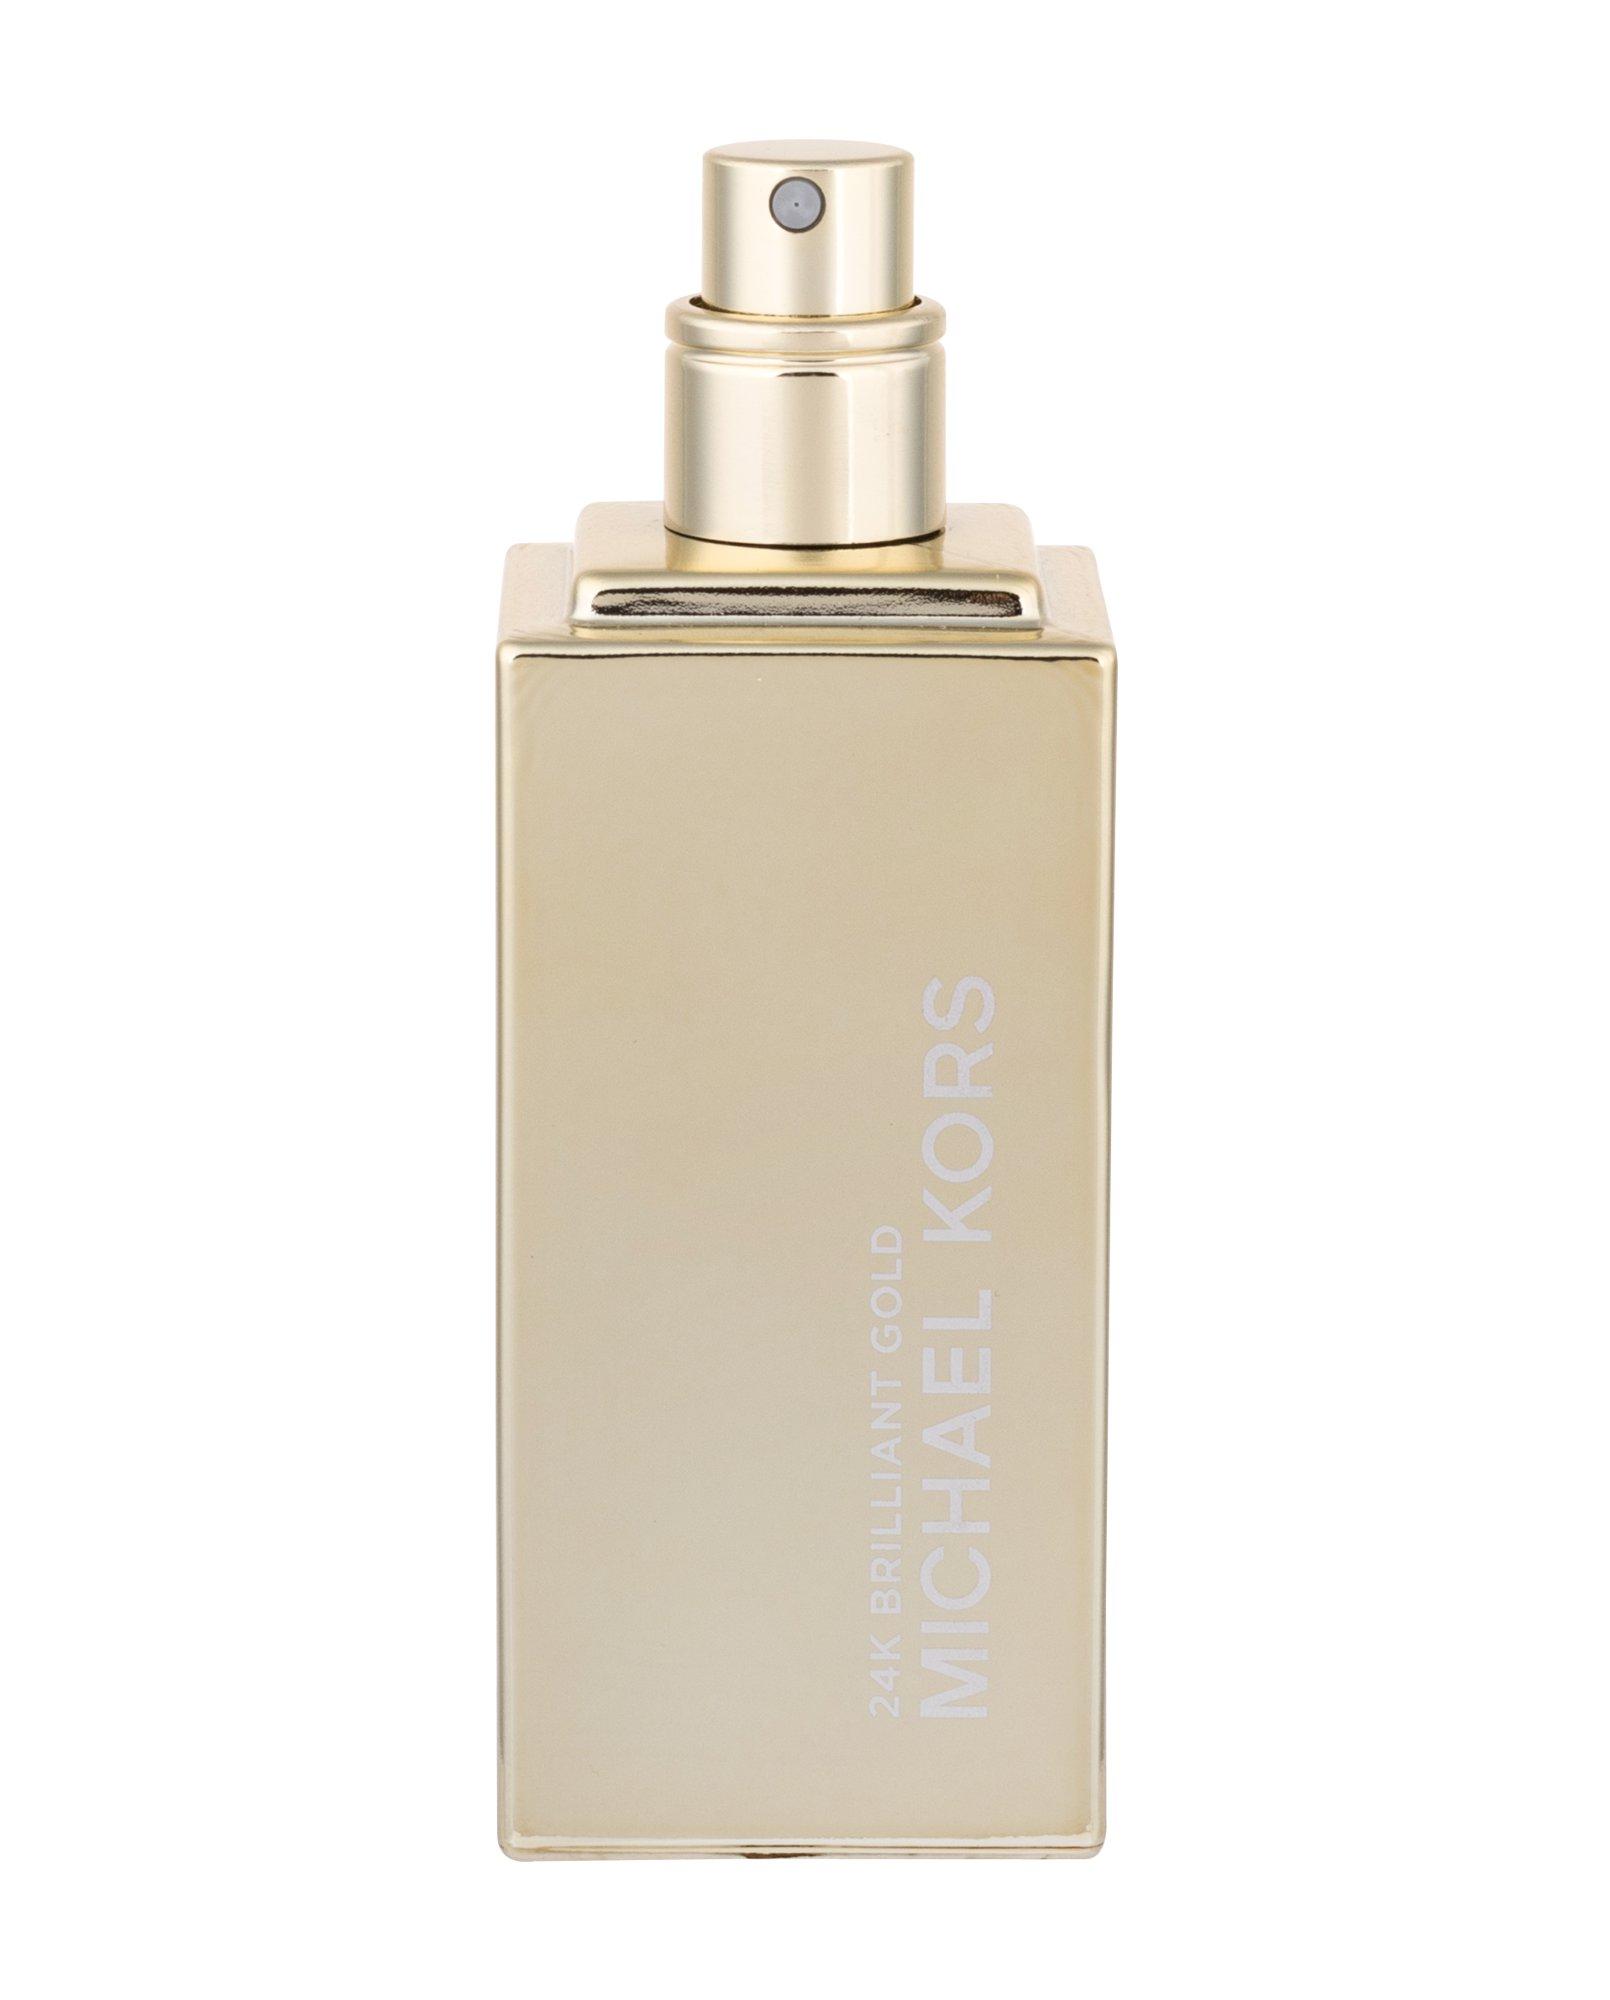 Michael Kors 24K Brilliant Gold, Parfumovaná voda 50ml, Tester